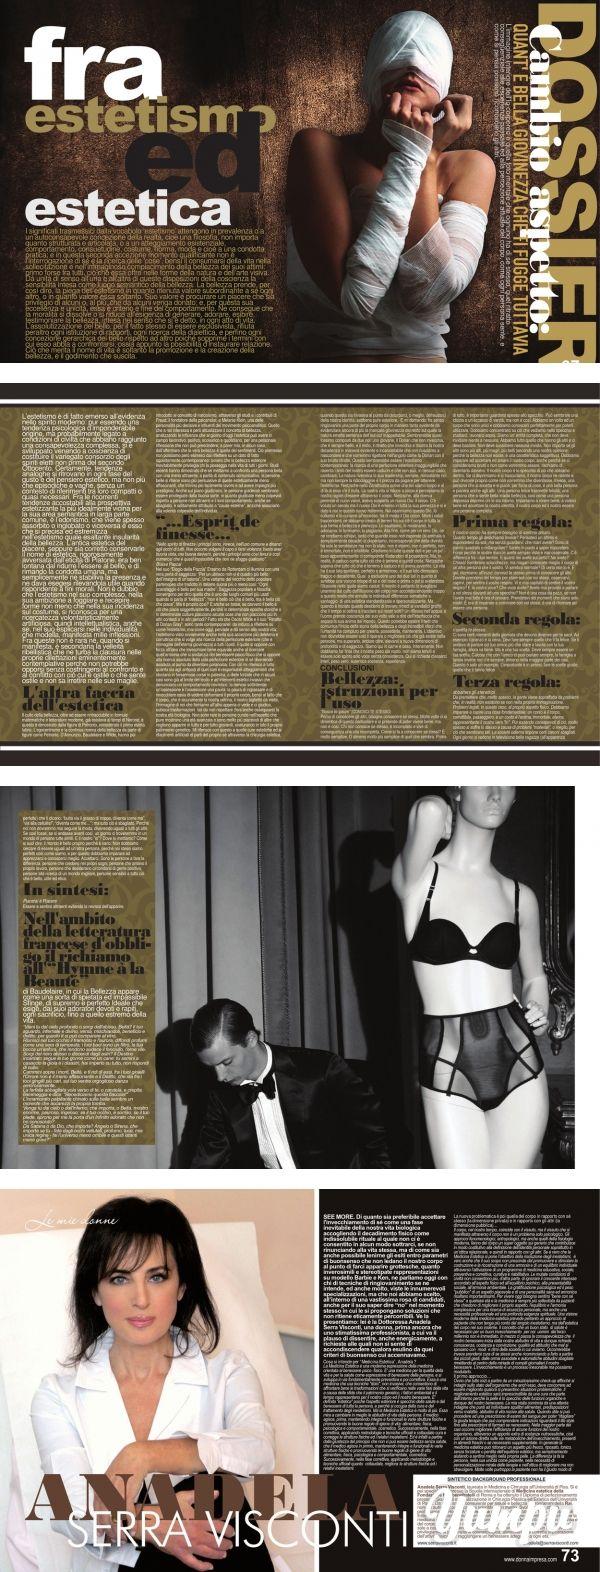 DONNA IMPRESA MAGAZINE: BELLEZZA - TRA ESTETISMO ED ESTETICA  di Valeriana Mariani con Anadela Serra Visconti. http://www.donnaimpresa.com https://www.yumpu.com/it/document/view/24322224/donna-impresa-magazine-dossier-fra-estetismo-ed-estetica